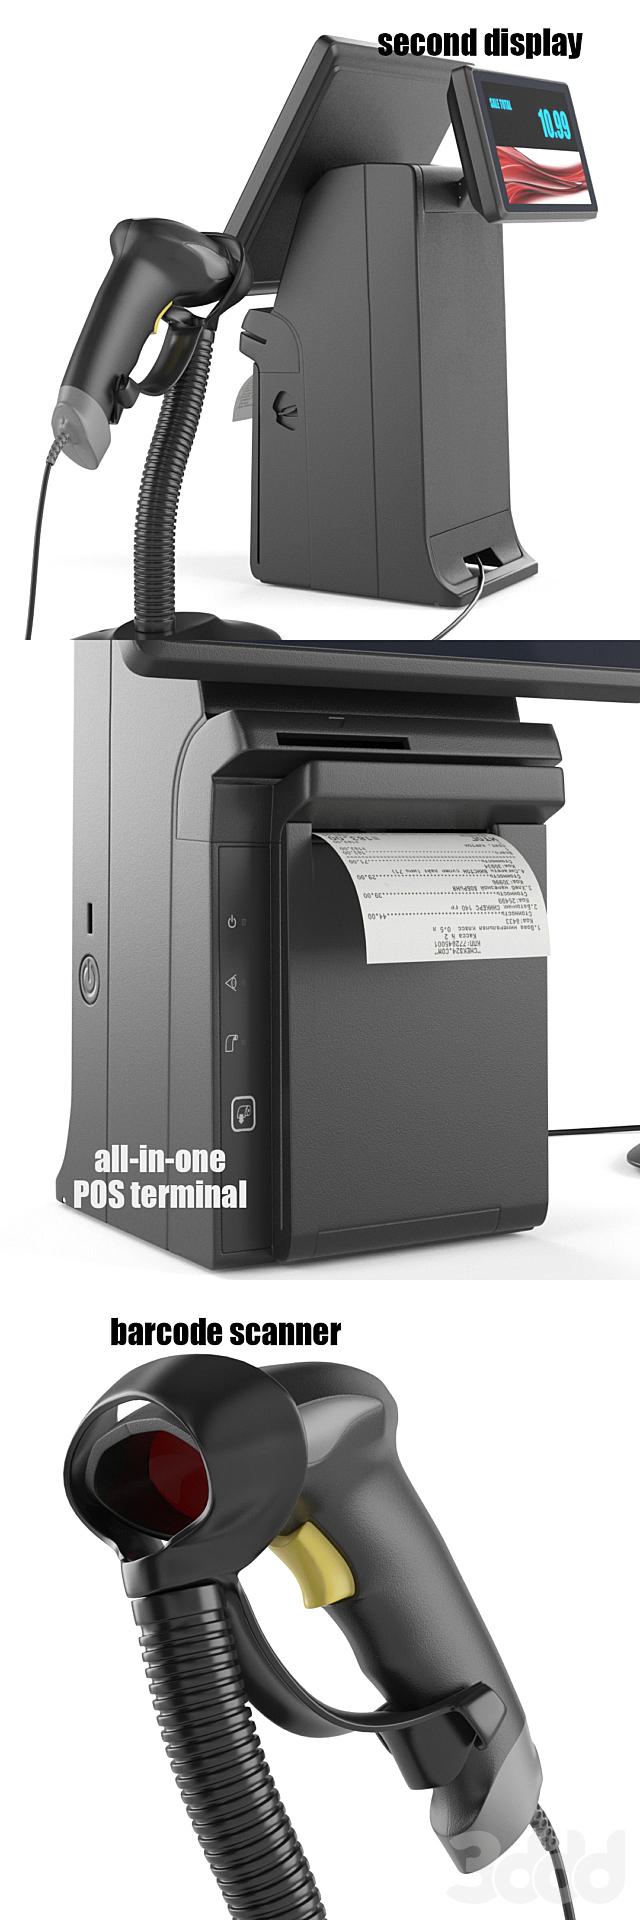 All-in-one POS terminal Posiflex HS2310